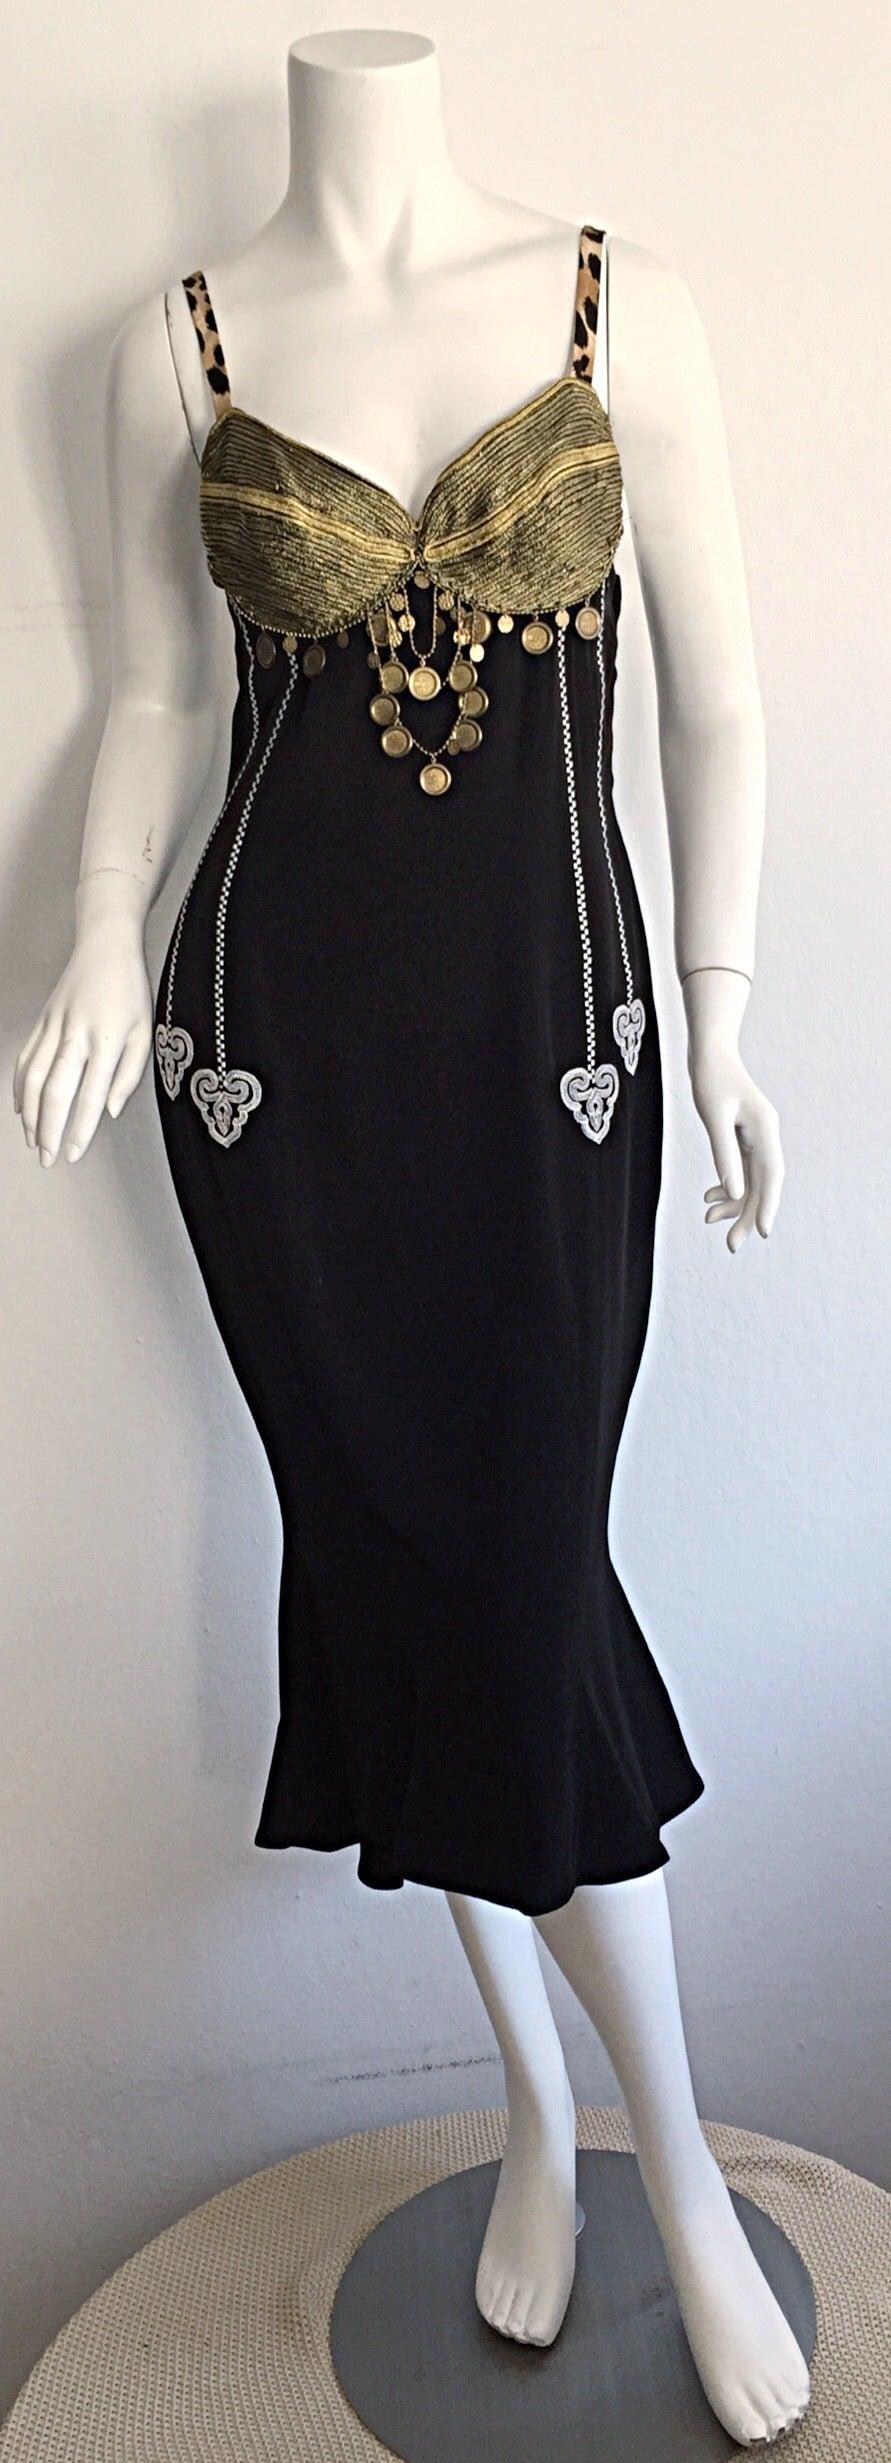 Black dress vintage - Super Rare Vintage Future Rifat Ozbek Sexy Ethnic Black Coin Dress 2